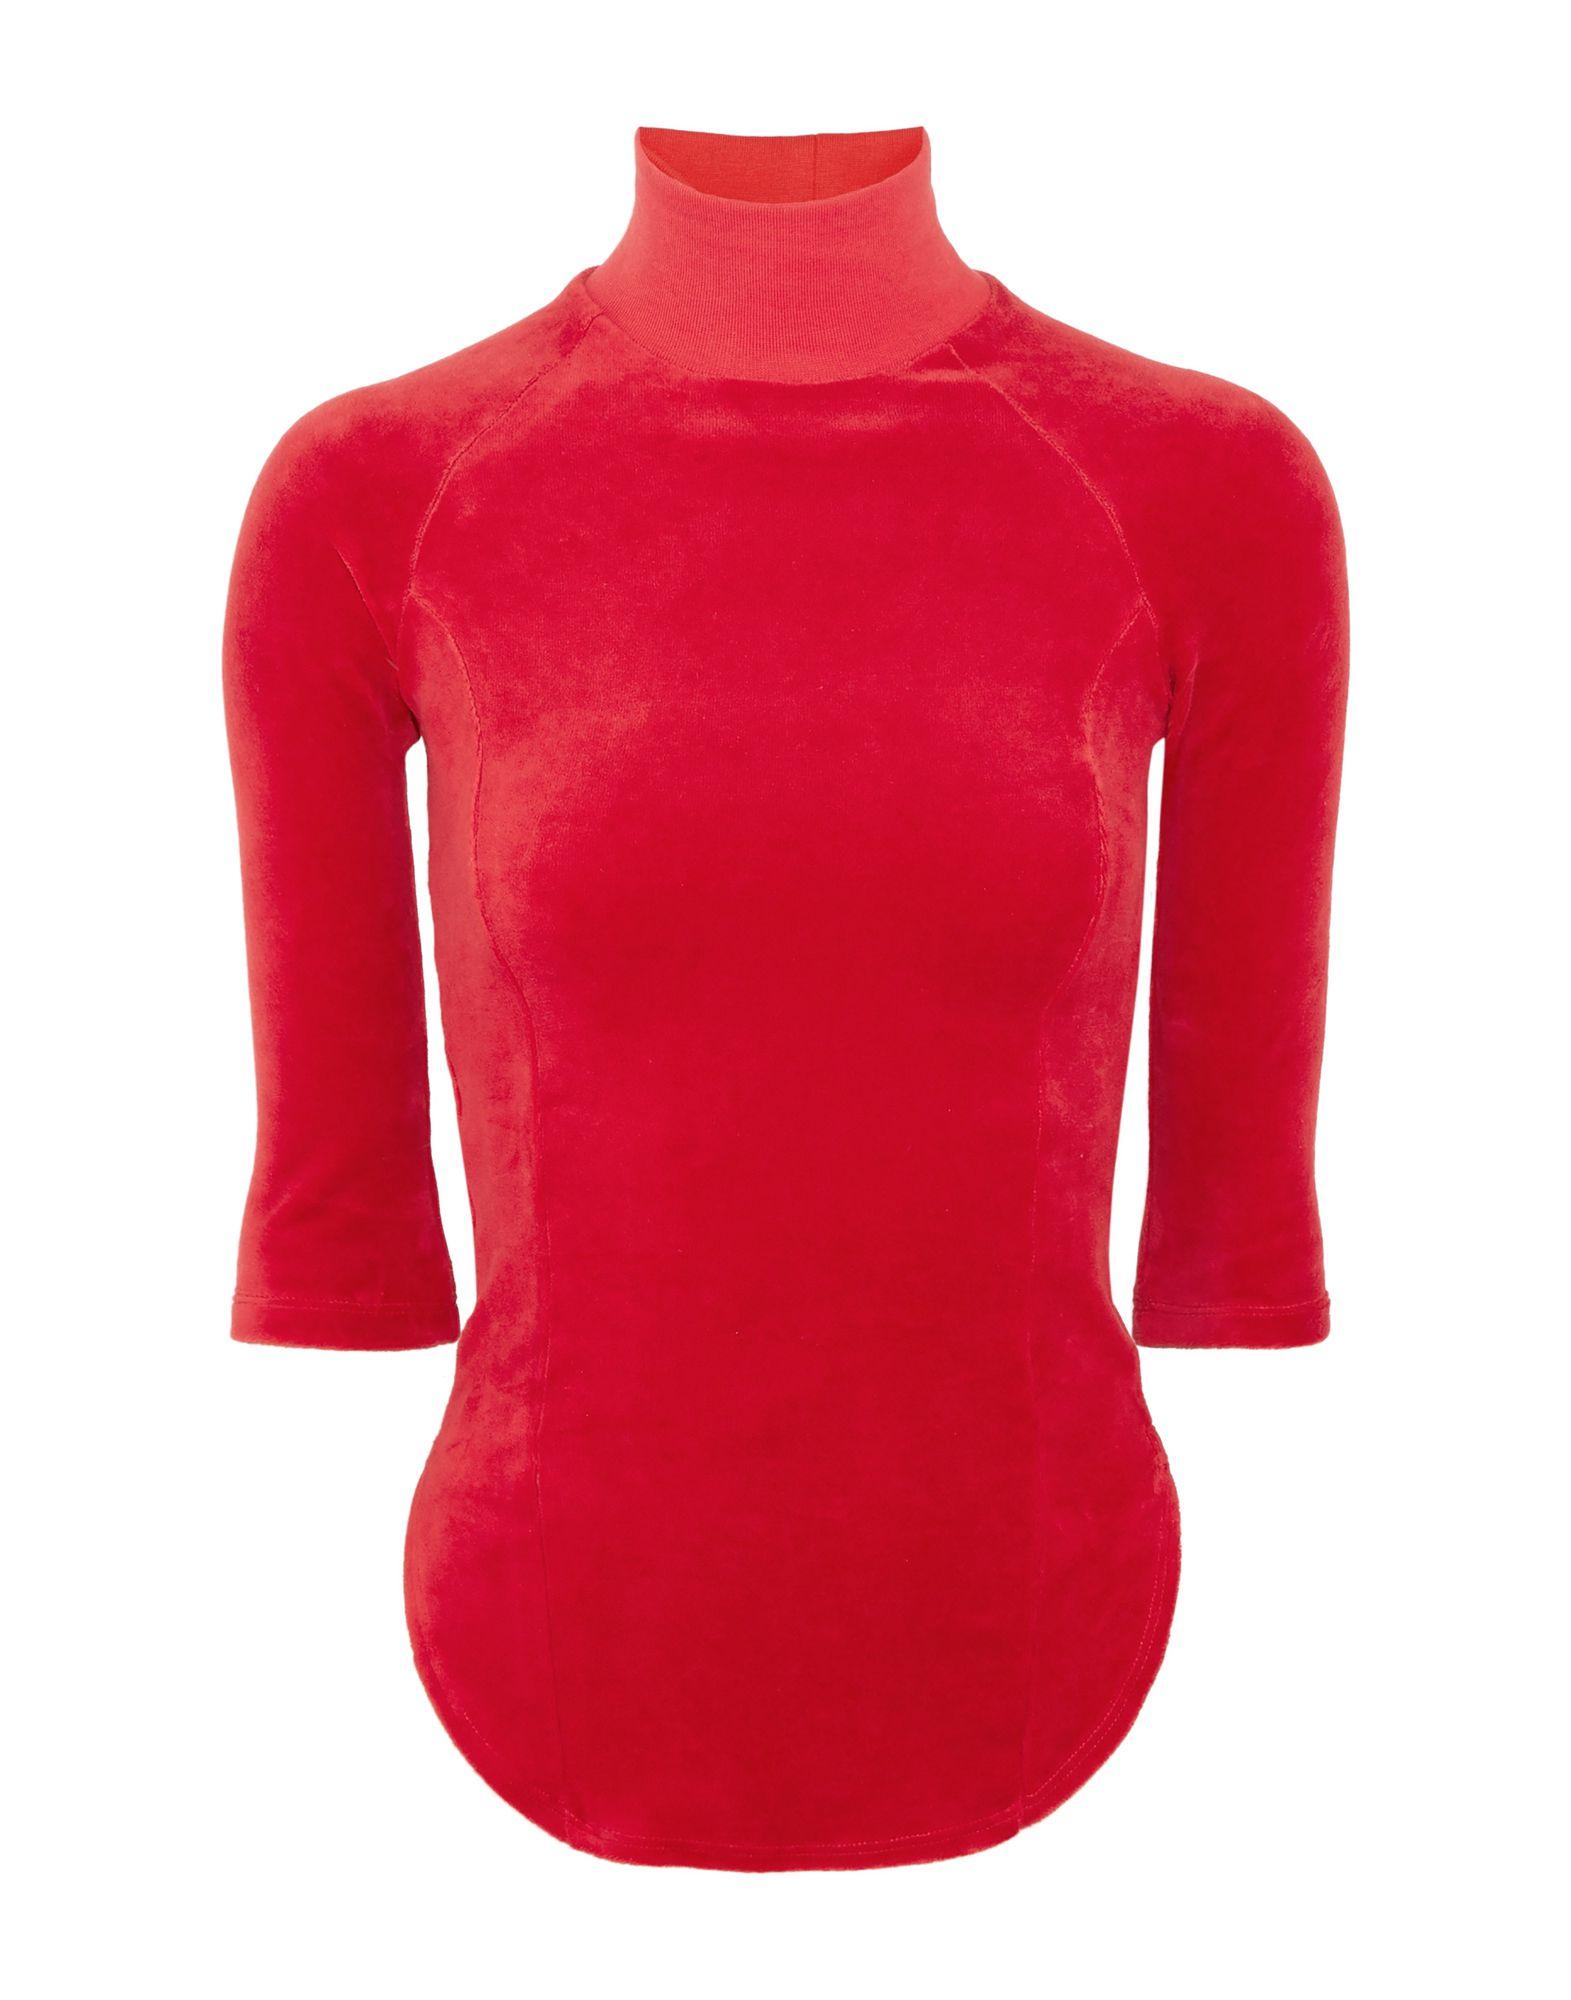 VETEMENTS x JUICY COUTURE Футболка fame couture футболка